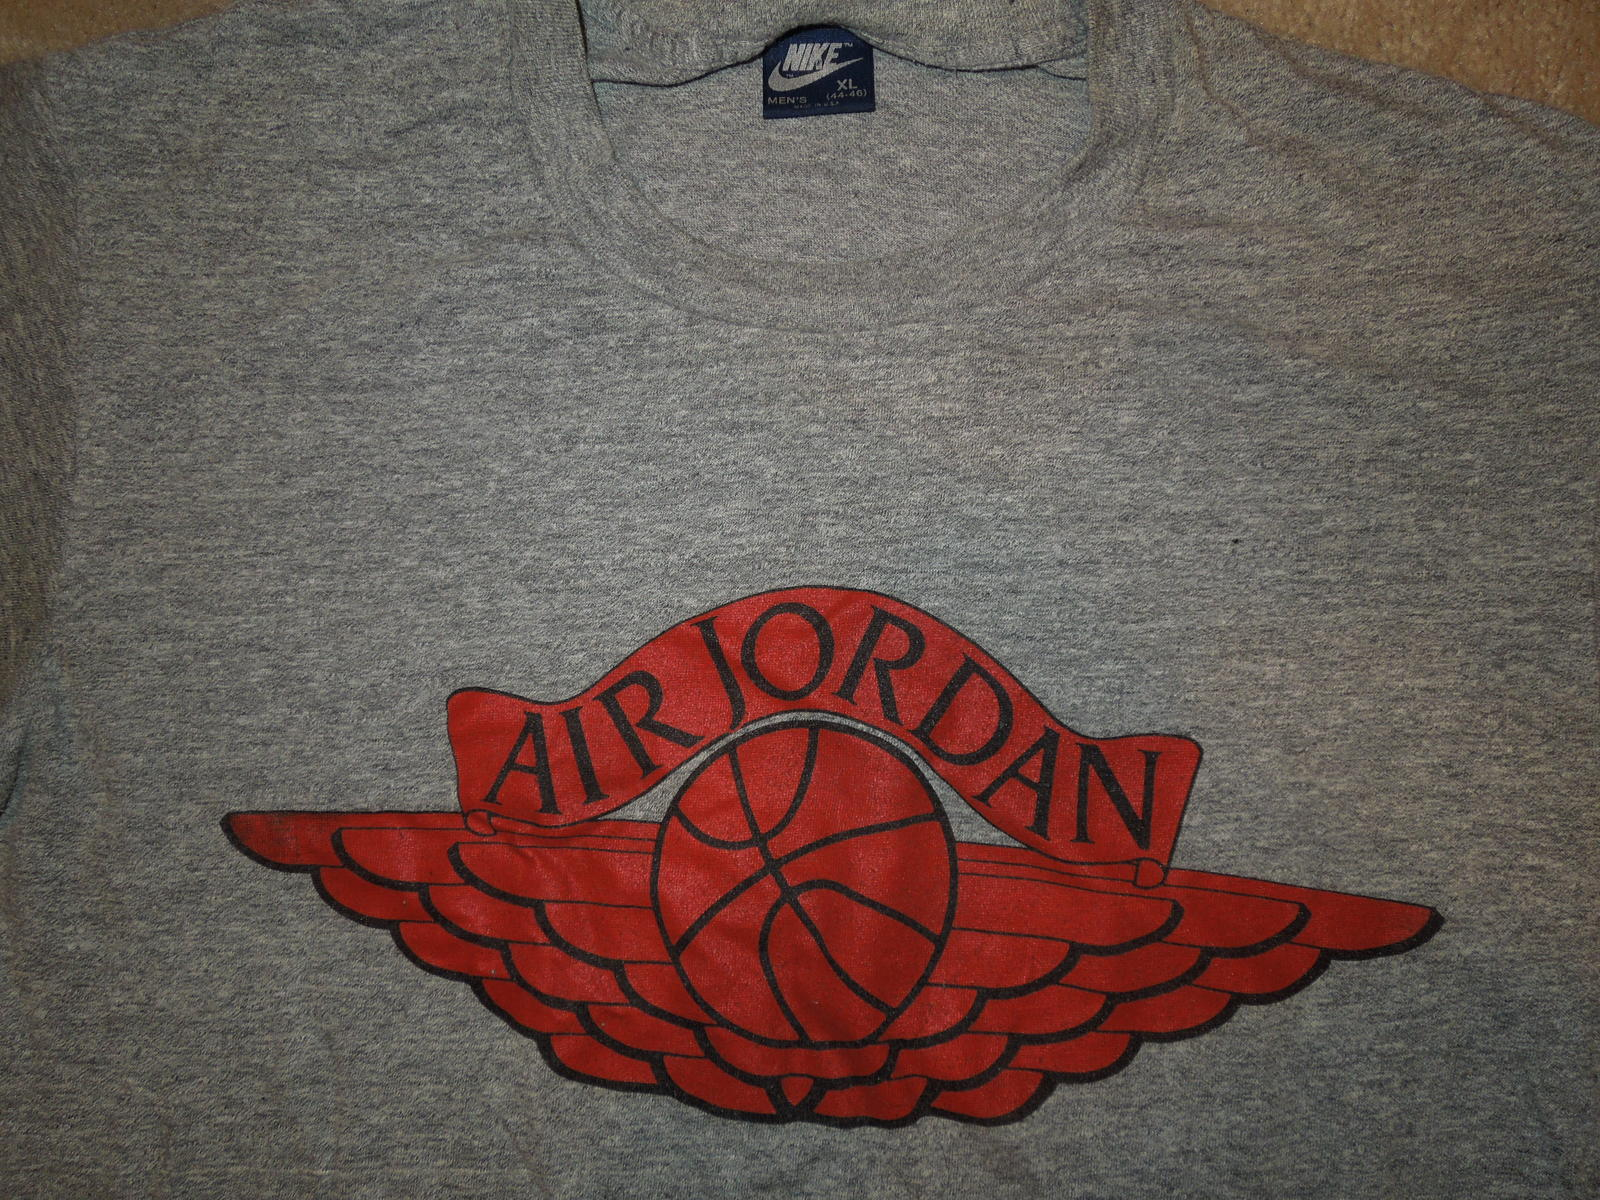 6d7f537485f0 Vintage Retro 80 s Blue Tag Air Jordan Nike and similar items